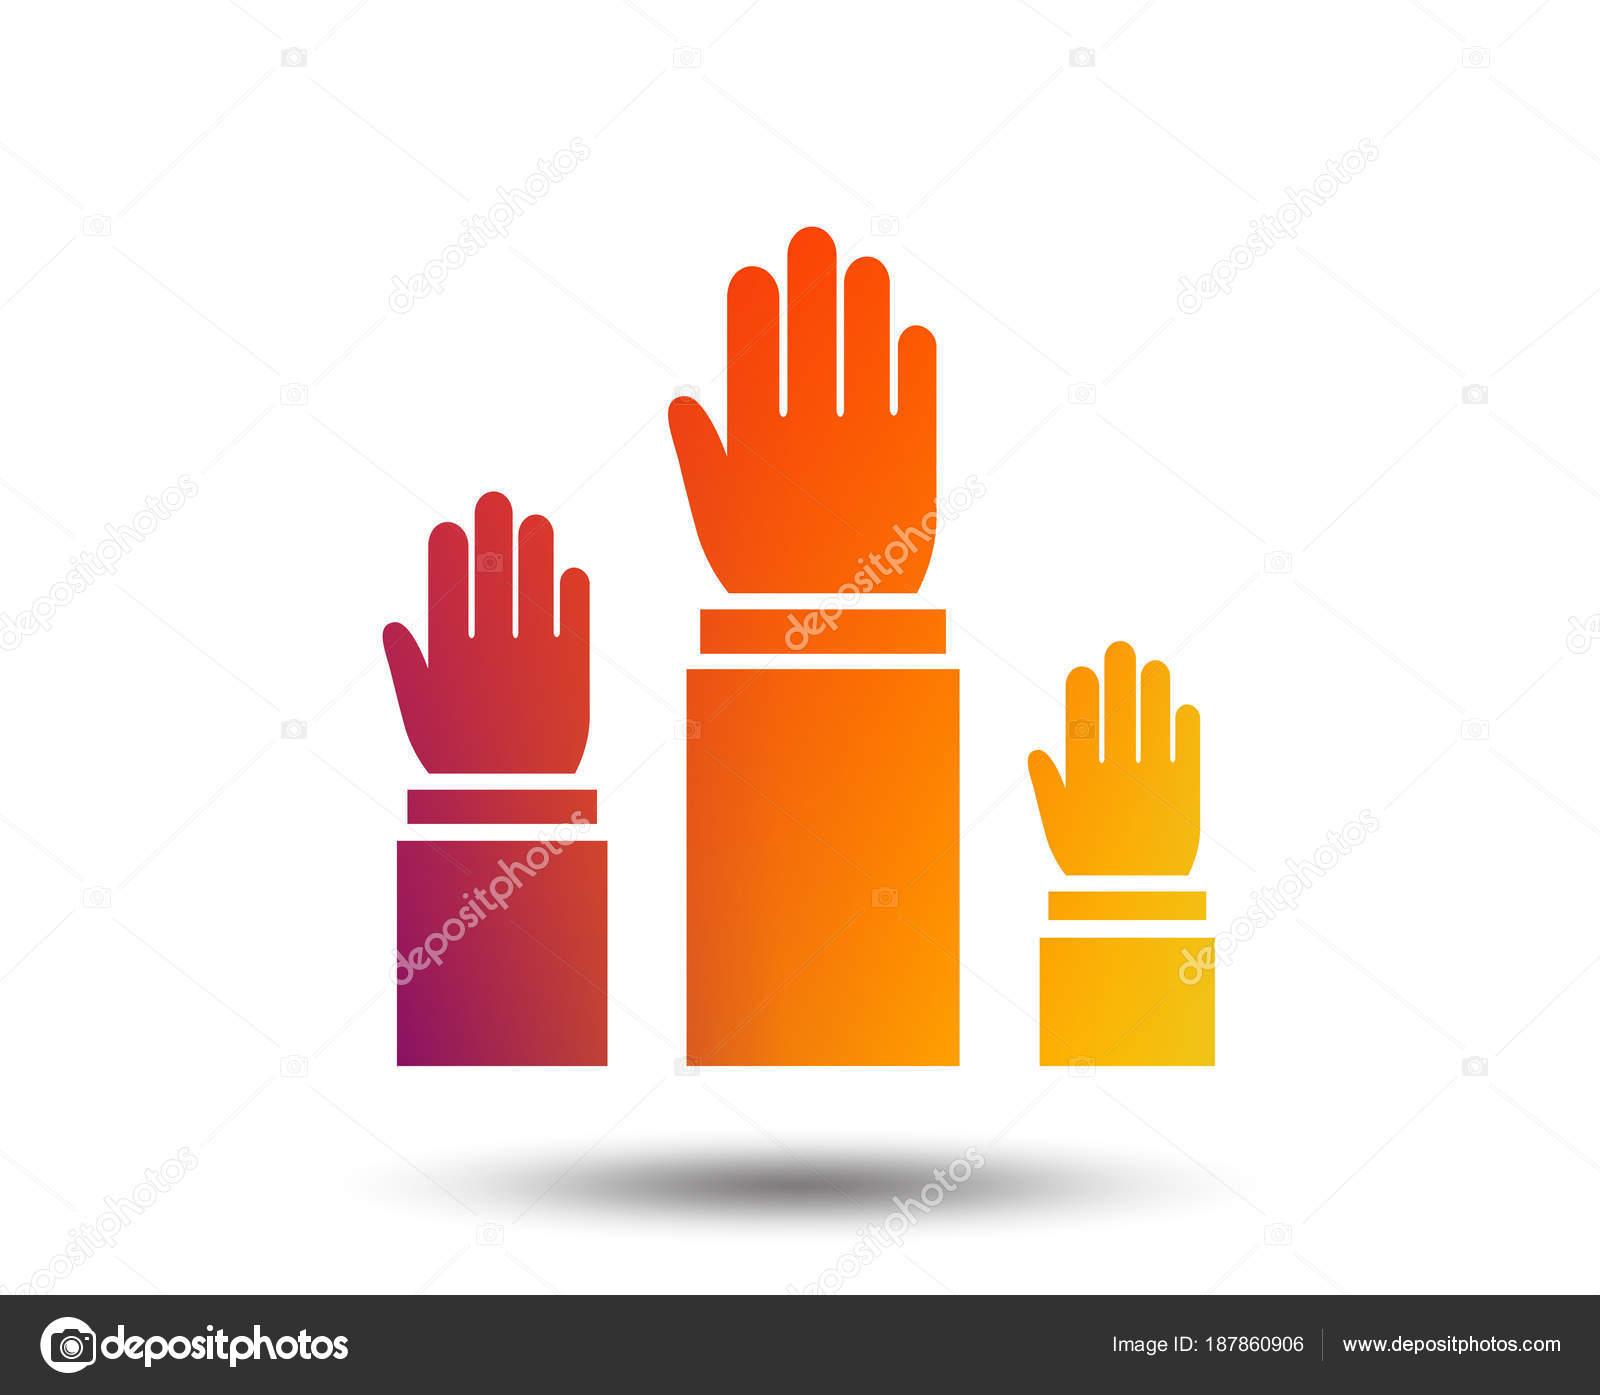 картинка знак поднятая рука